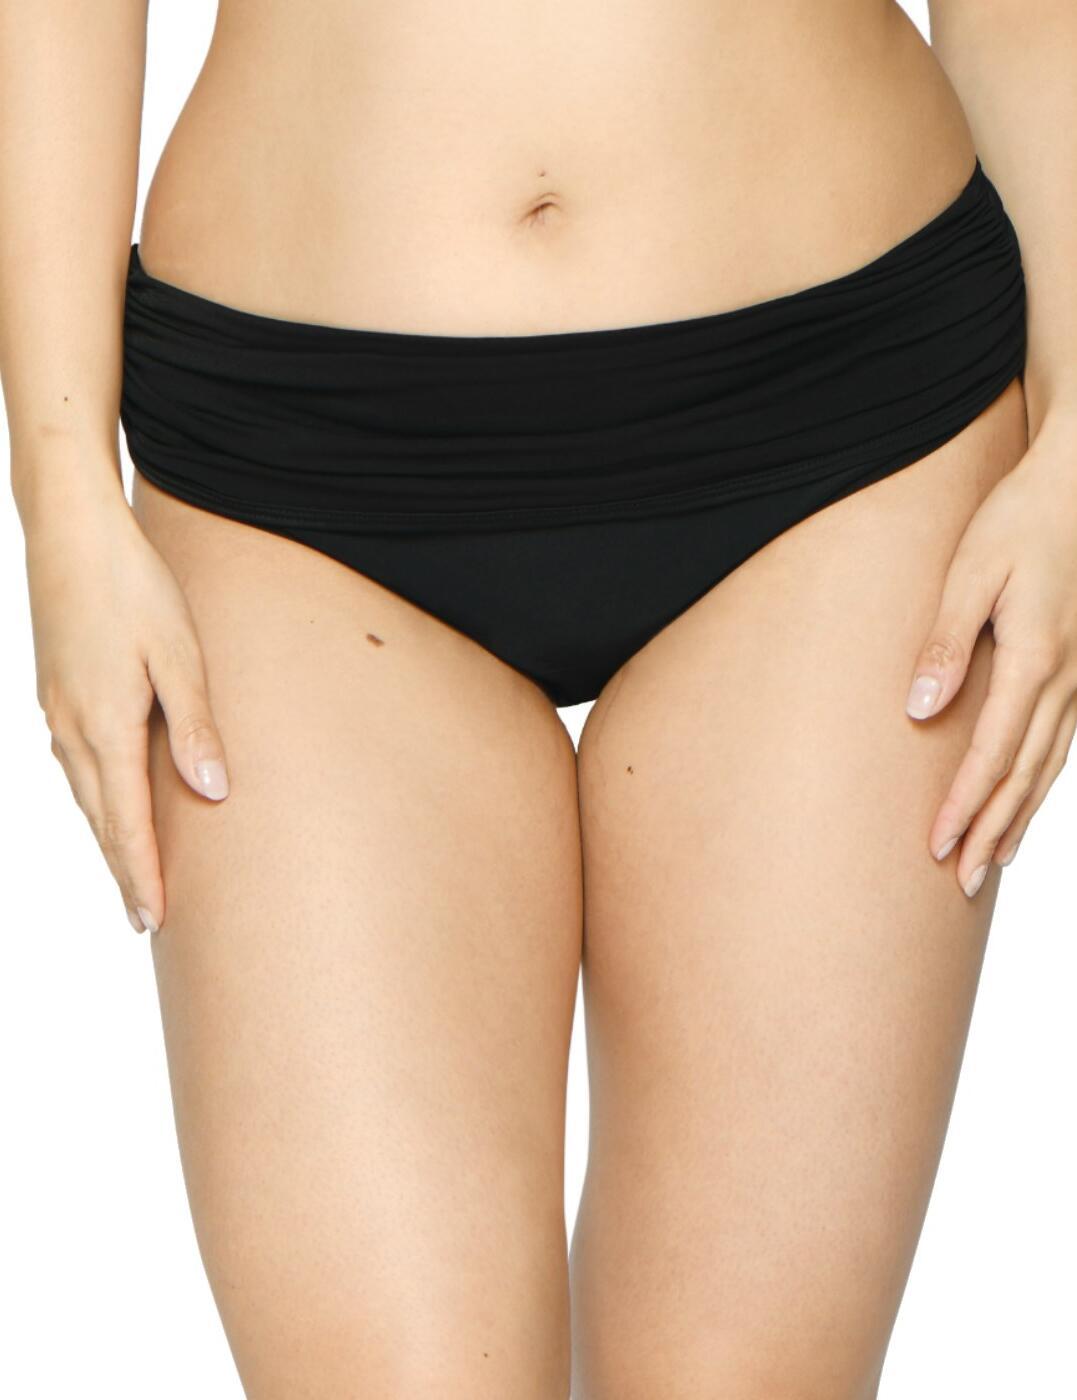 CS001512 Curvy Kate Sheer Class Deep Fold-Over Bikini Brief - CS001512 Black